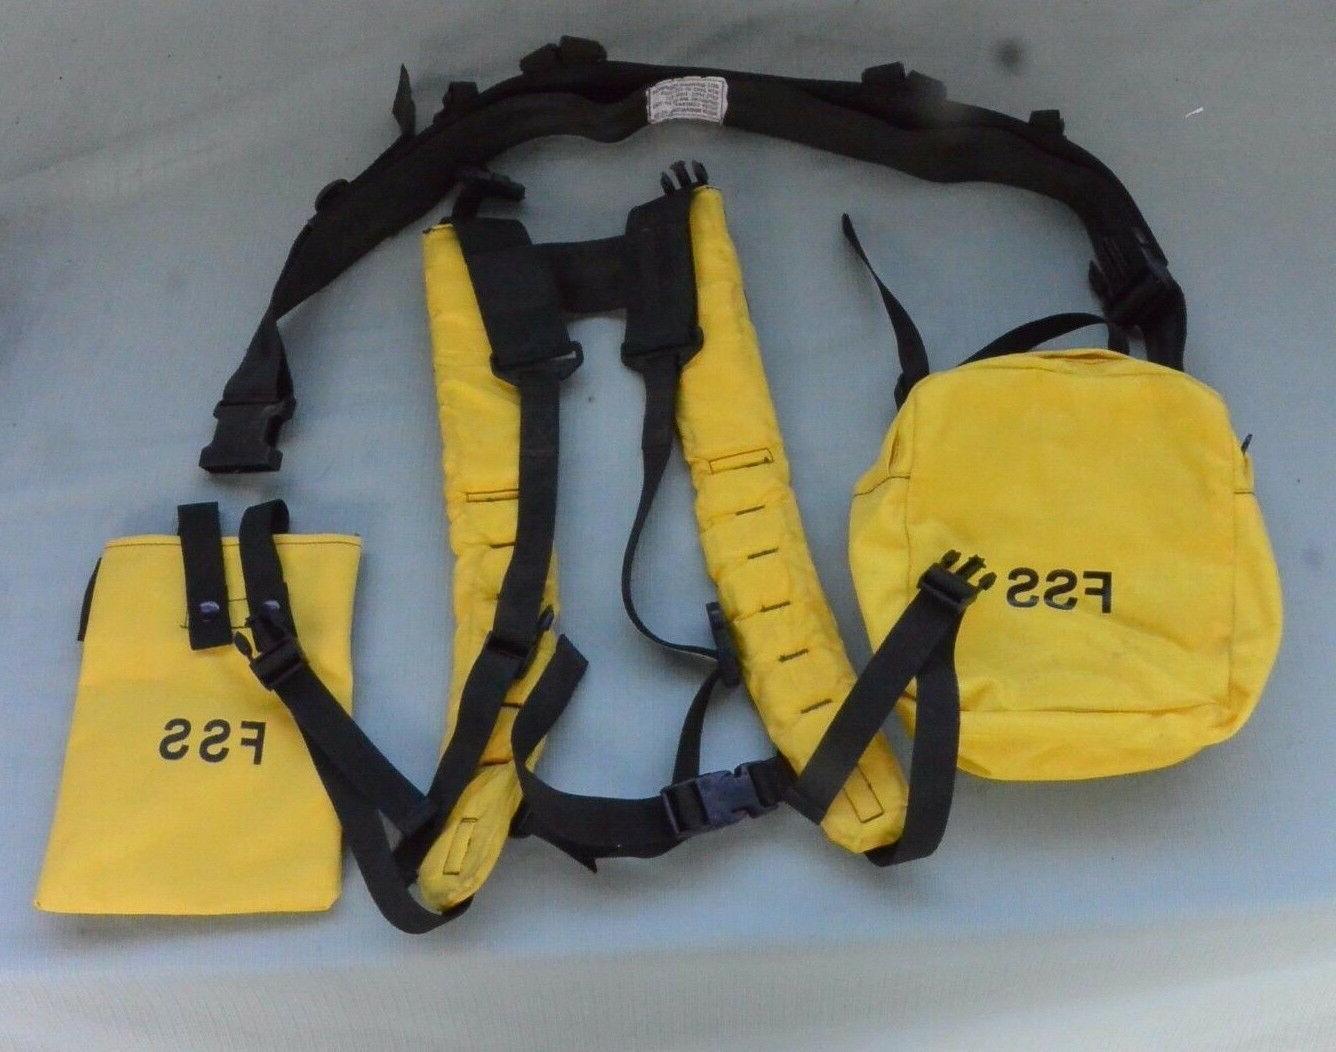 new firefighter web gear belt pack hunting